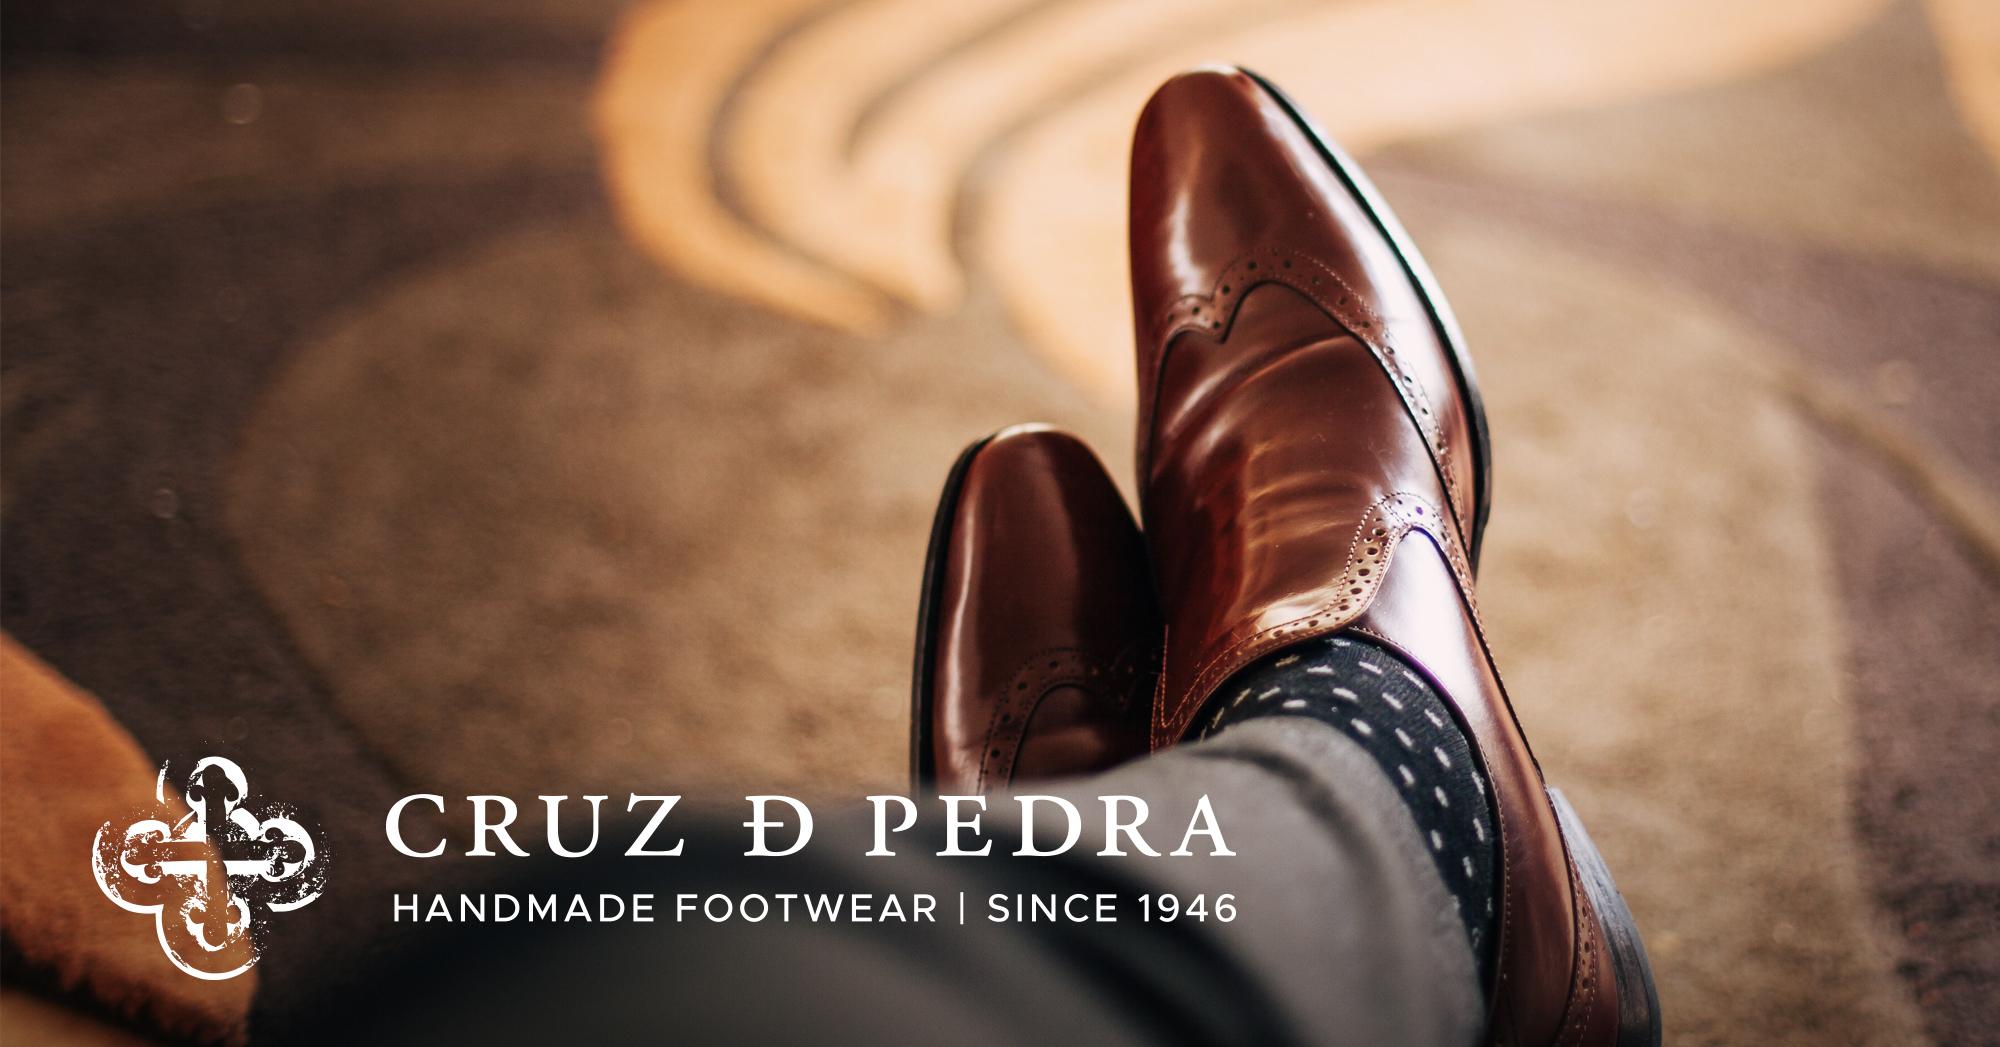 Portuguese handmade footwear for men, since 1946 | Cruz de Pedra